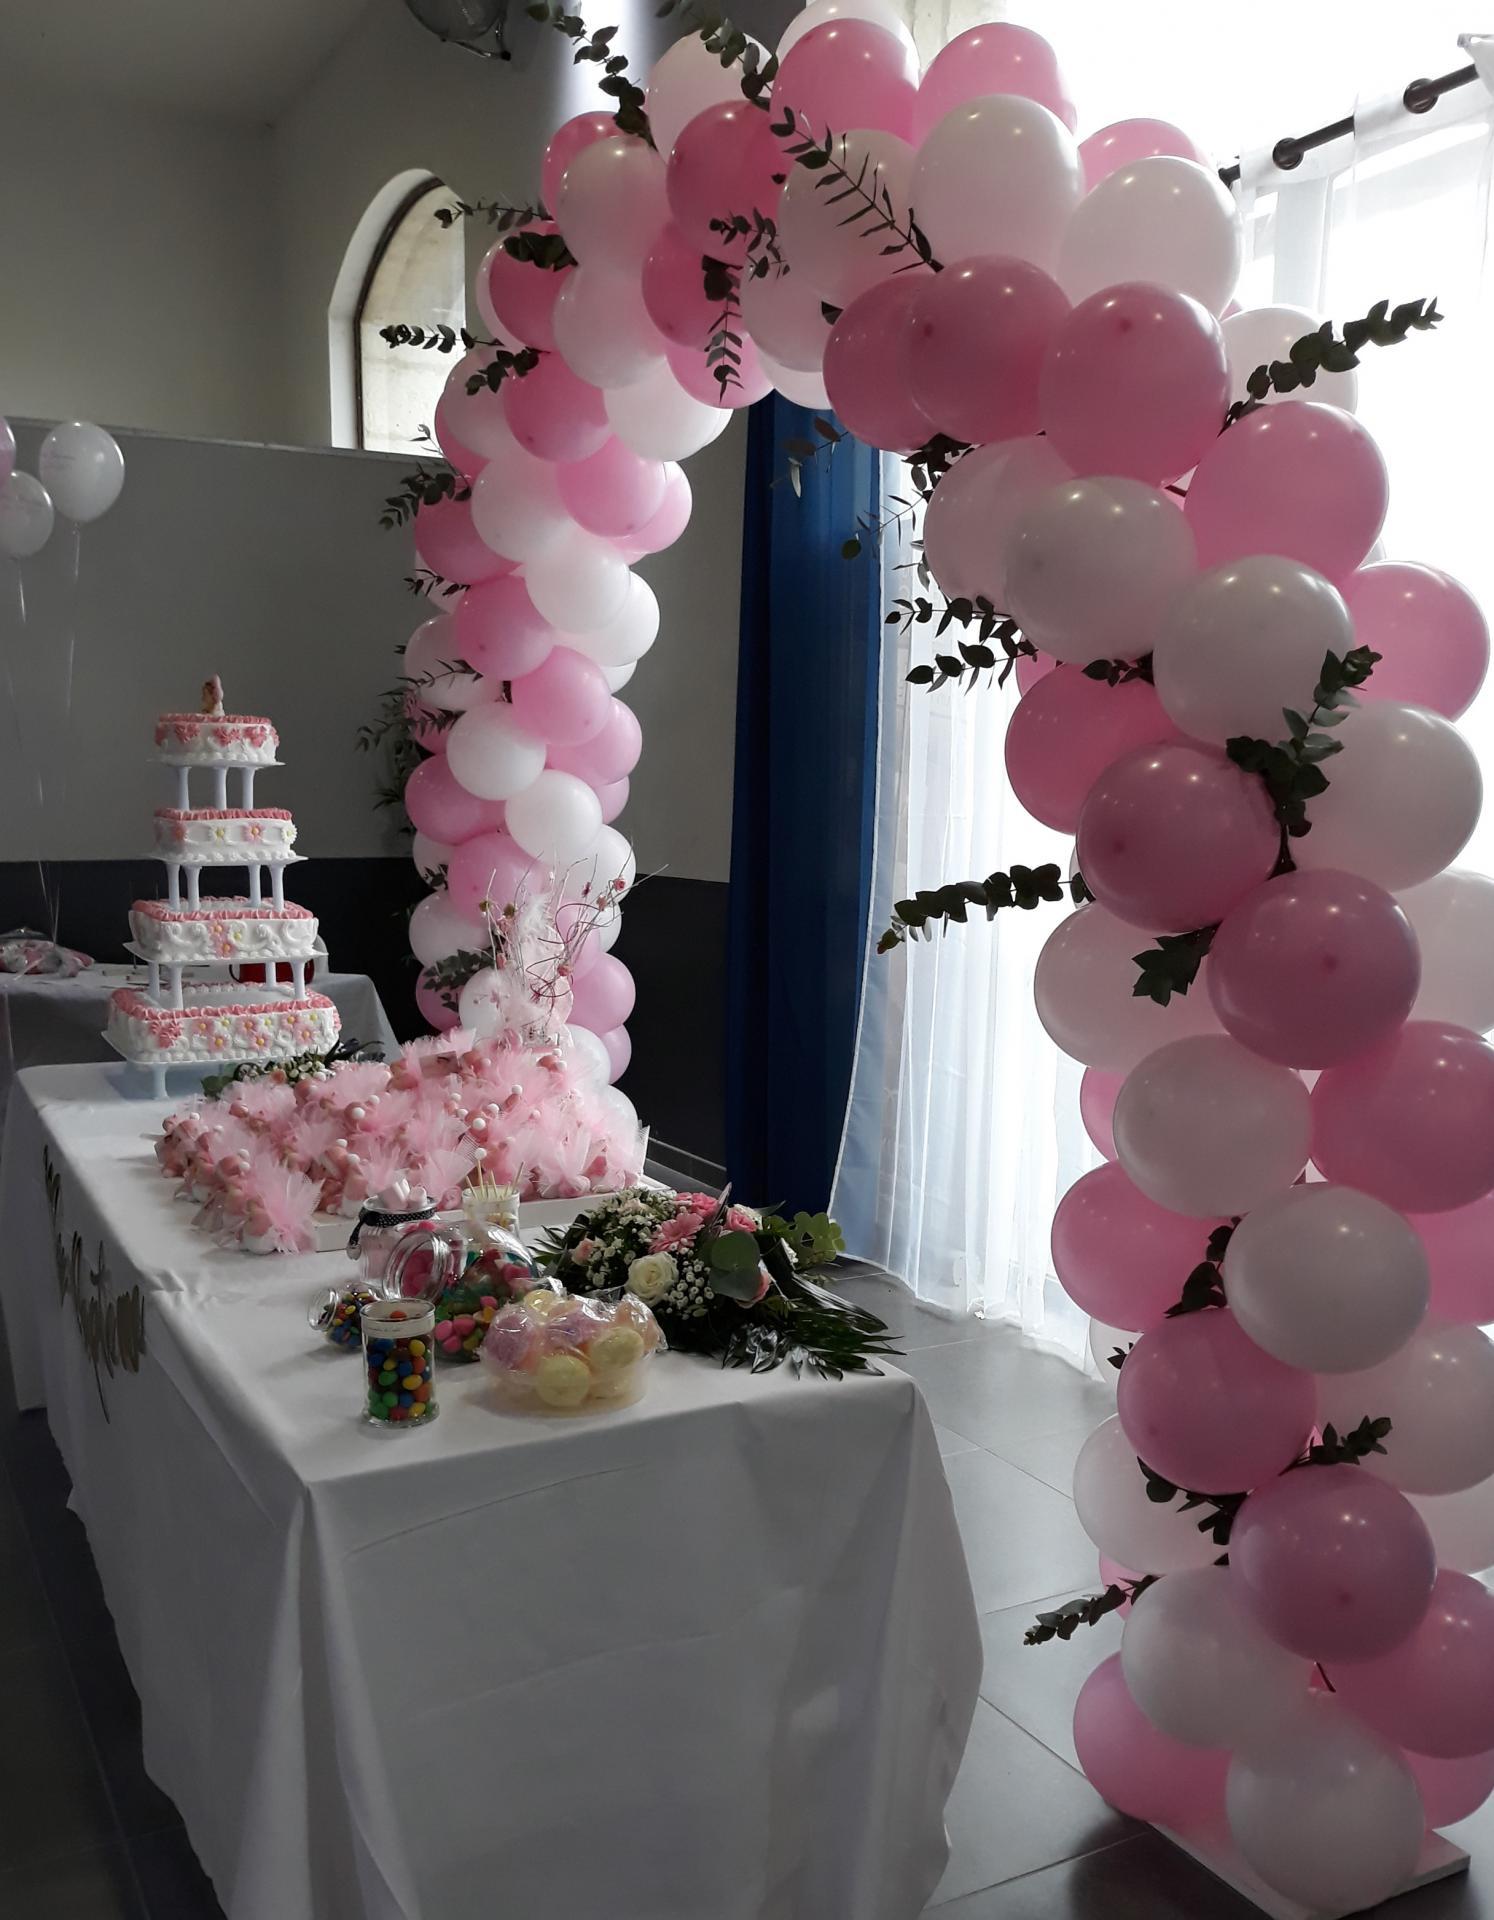 Arche ballon buffet desserts